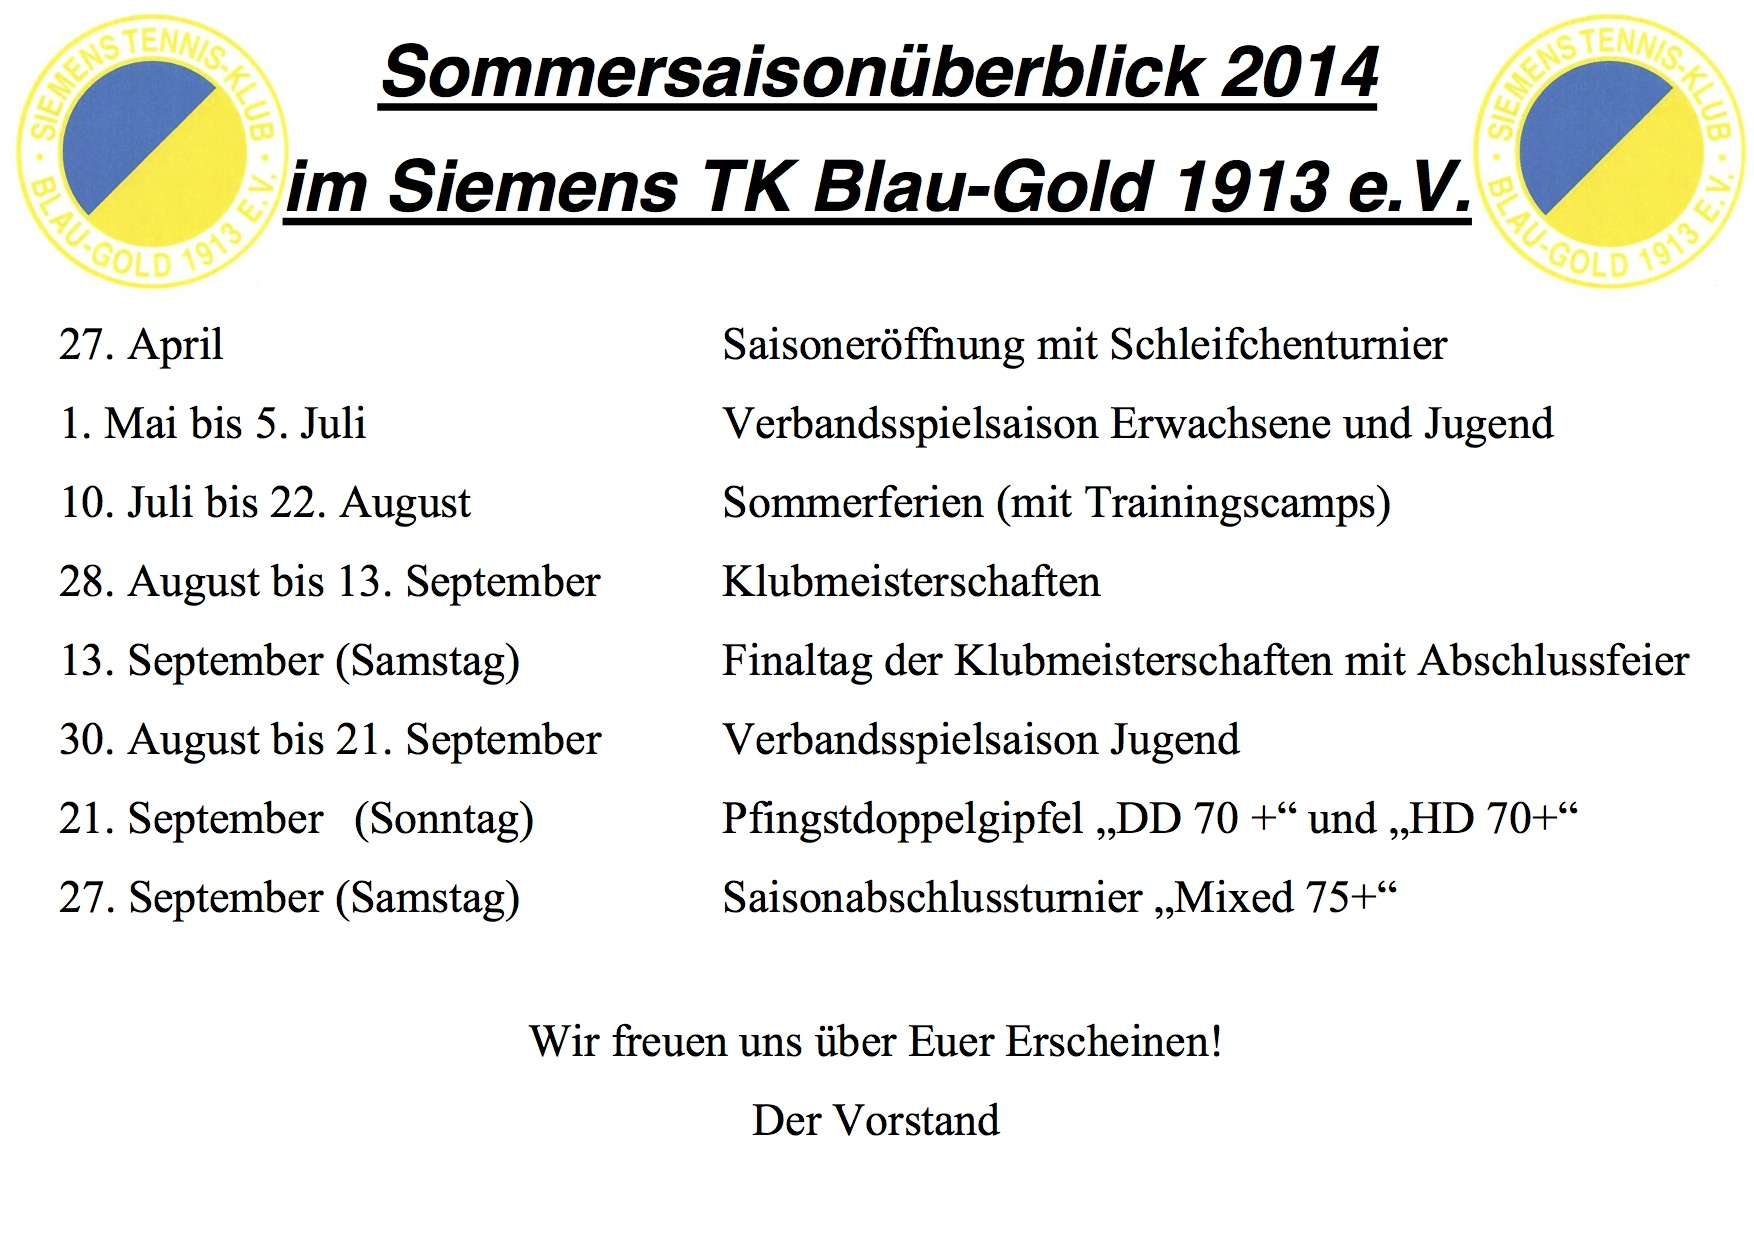 2014_Sommersaisonüberblick 2014.jpg